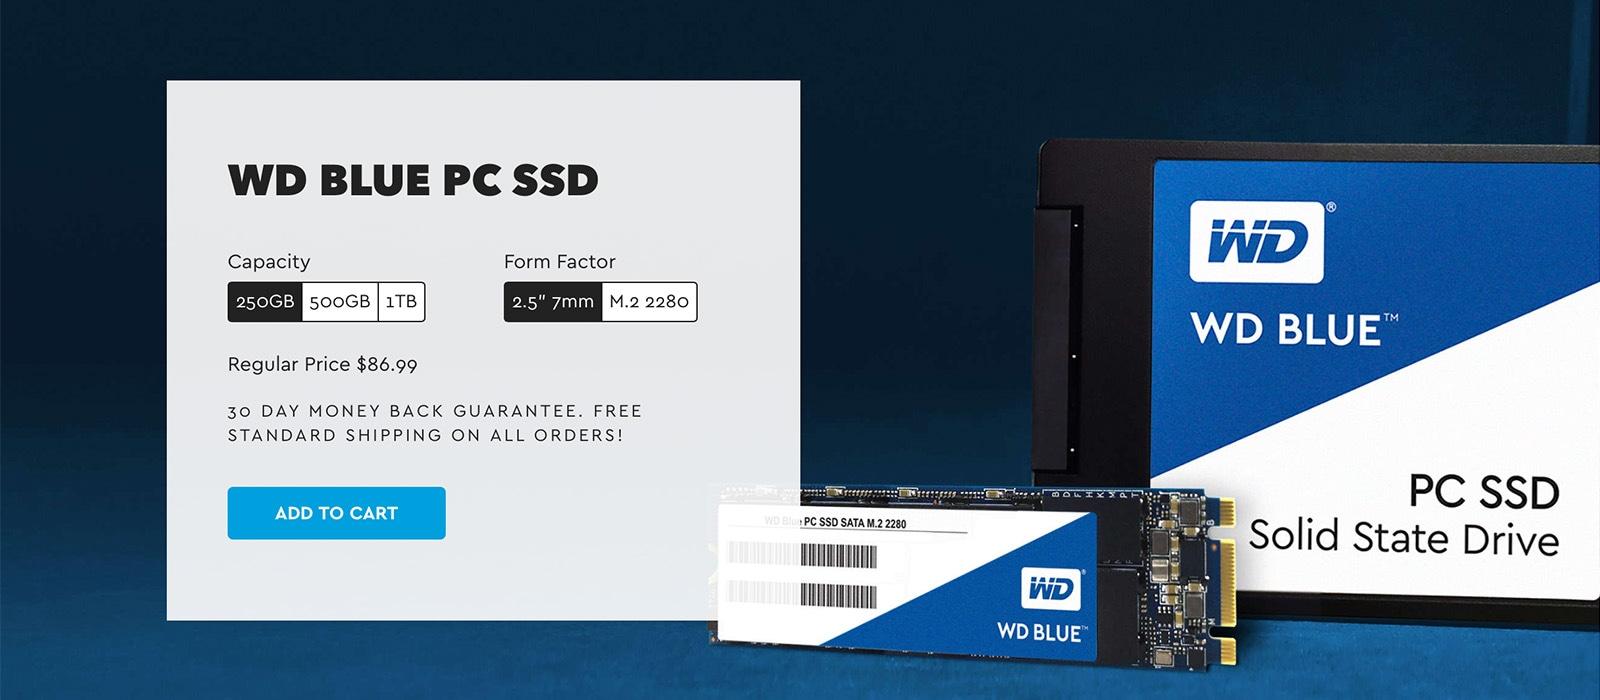 Western Digital WD Blue PC SSD